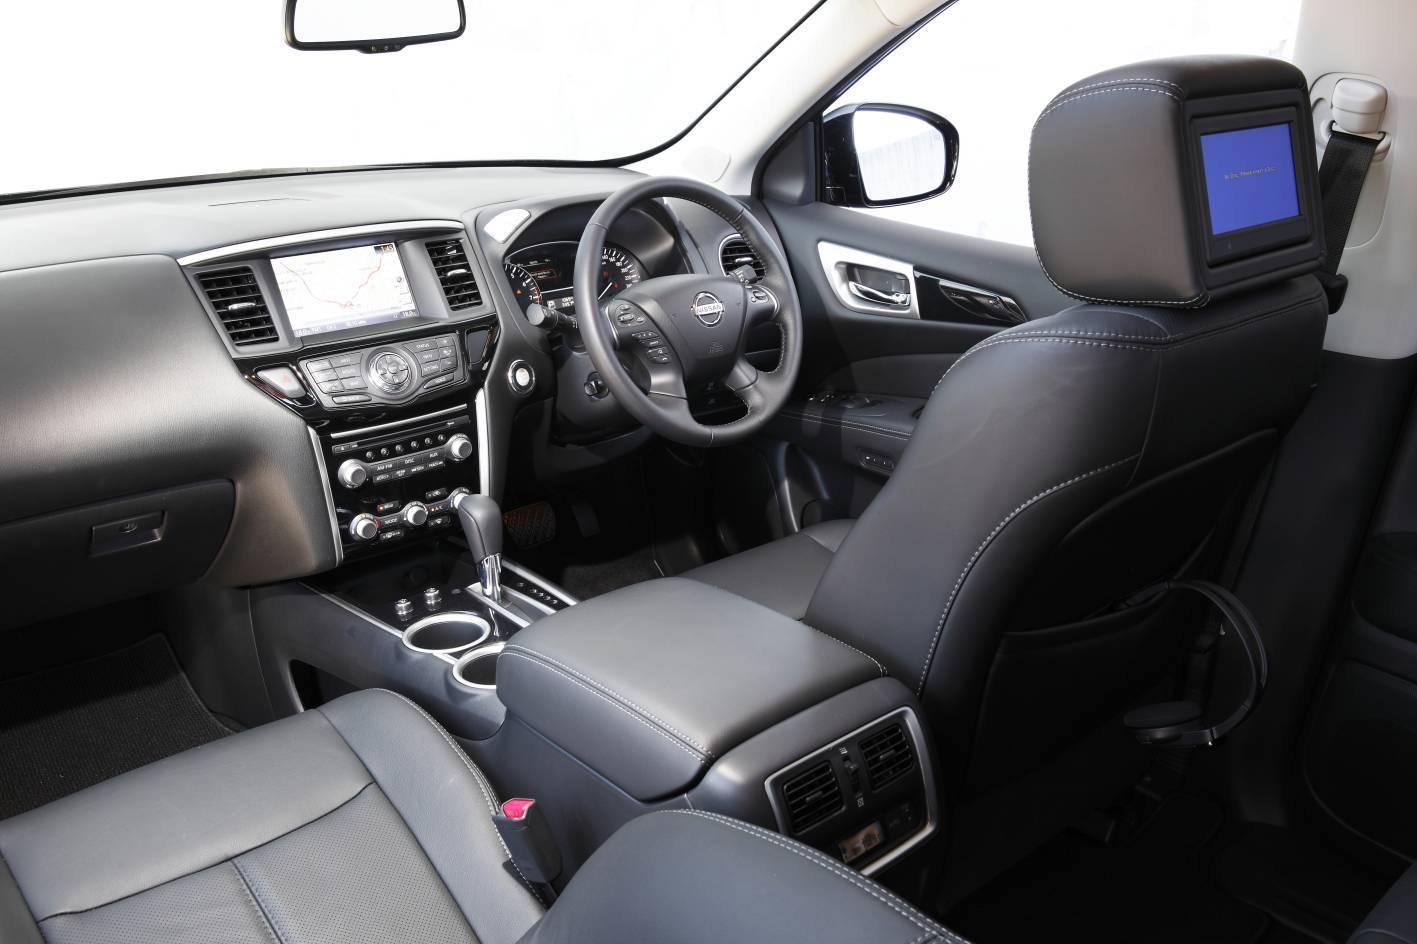 2013 Nissan Pathfinder interior - ForceGT.com